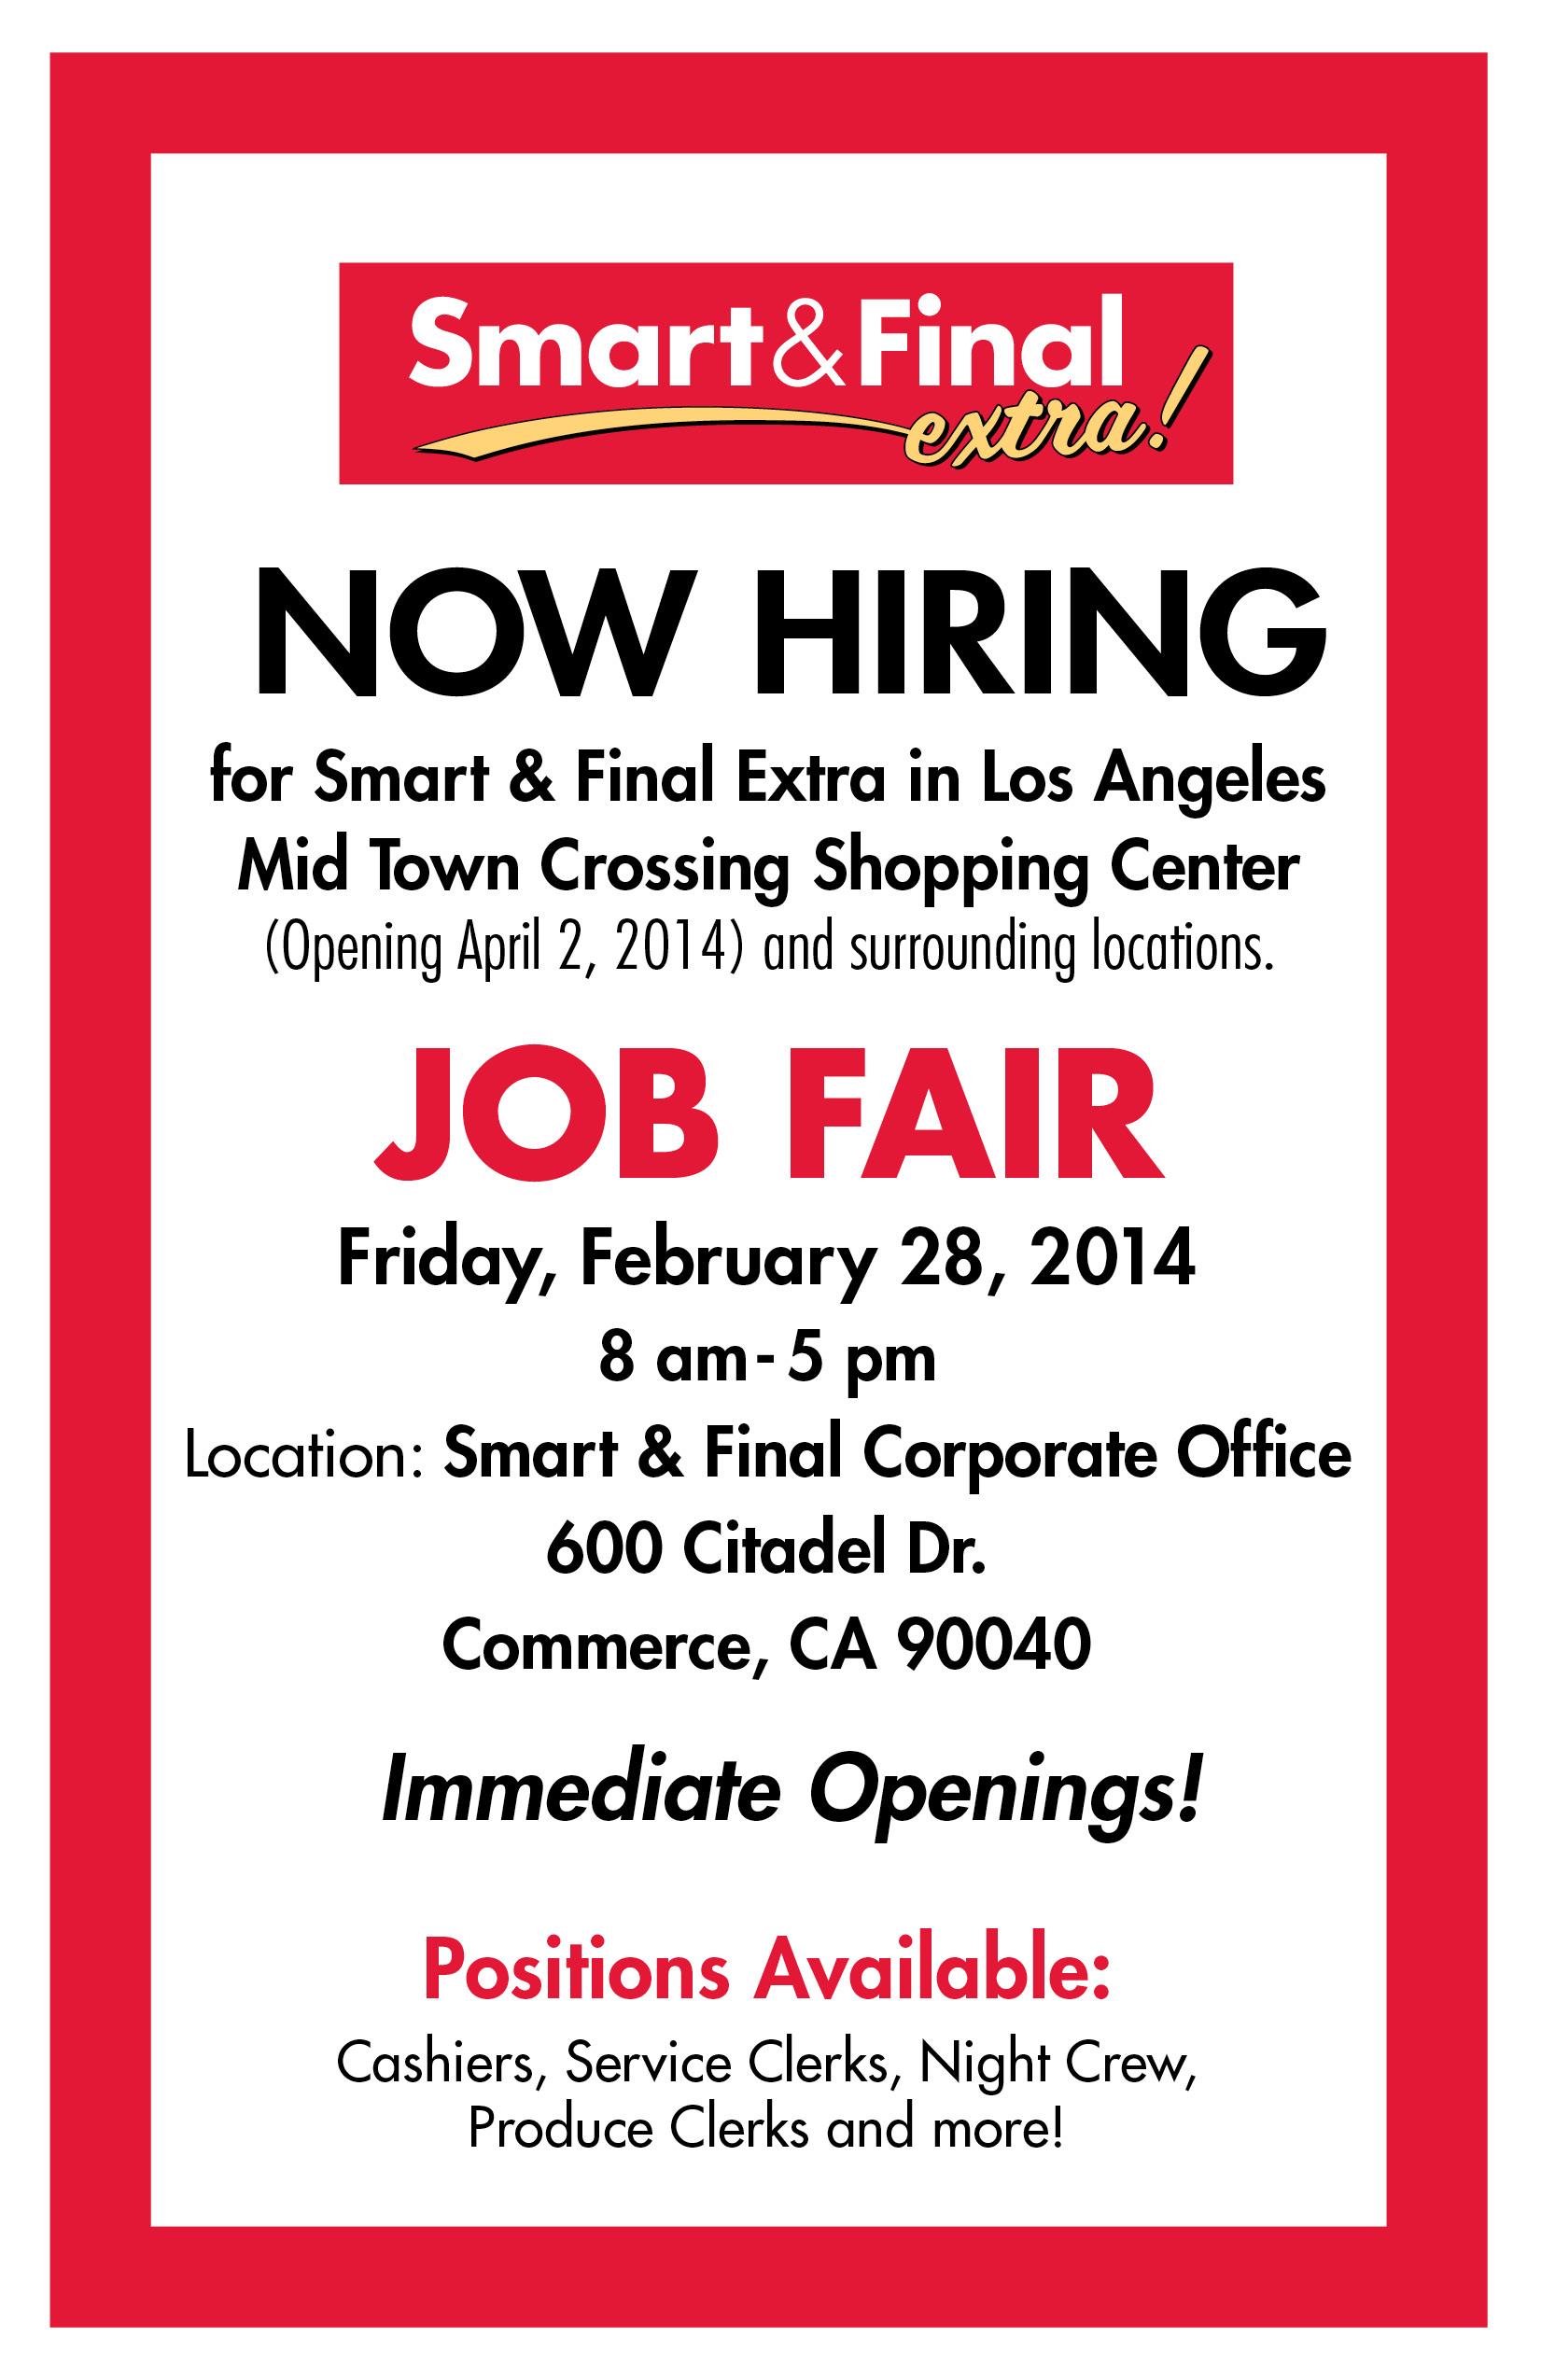 Smart & Final Mid Town Crossing – Now Hiring – Job Fair